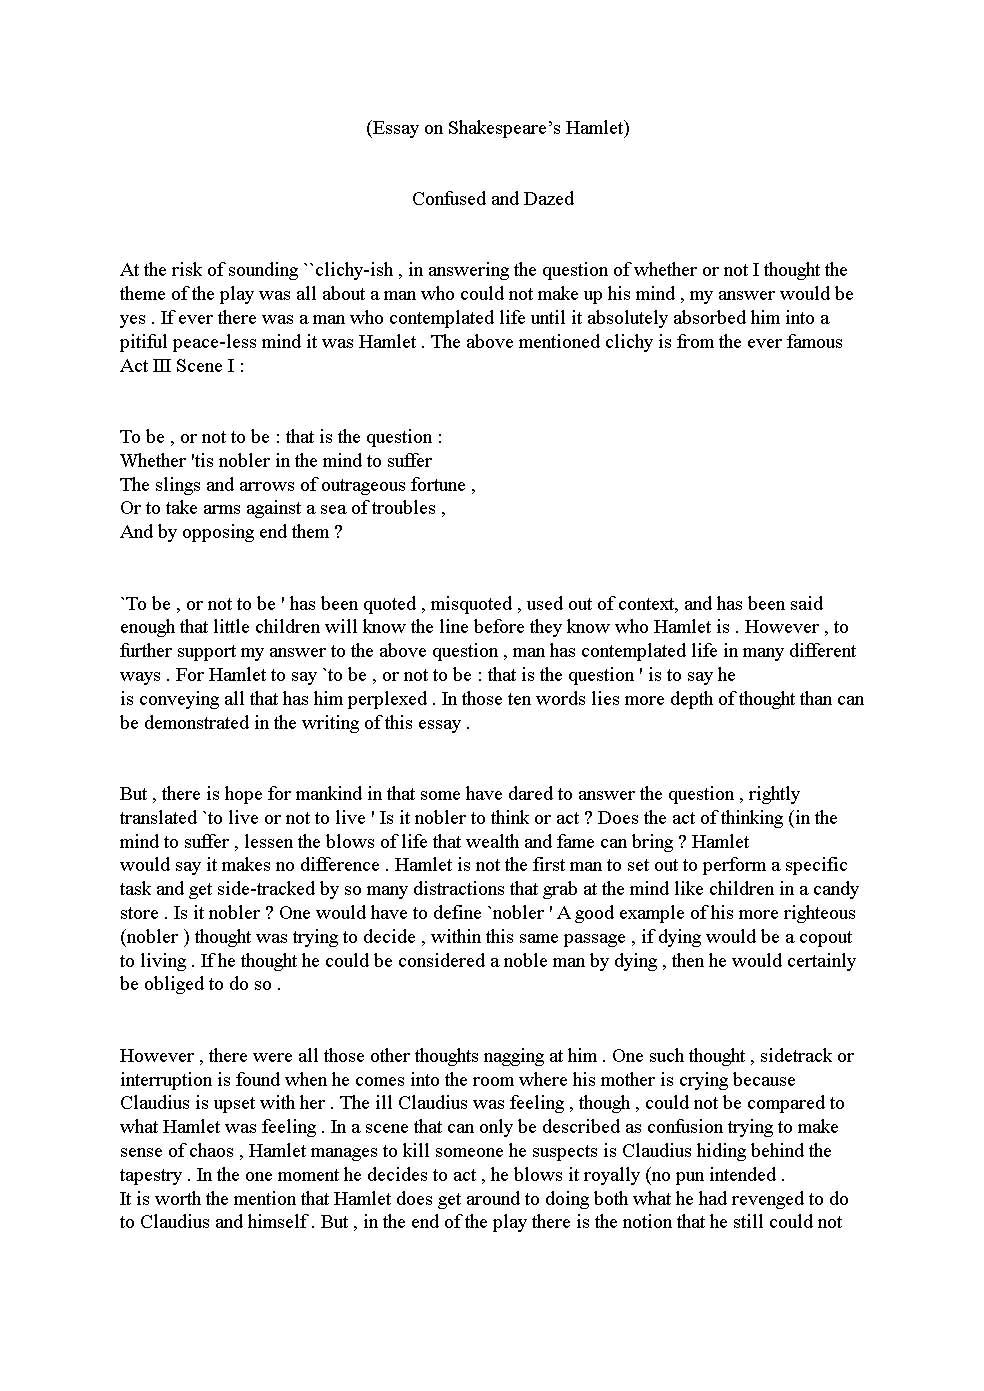 005 Public Speaking Essay Stunning Topics Example Introduction Full